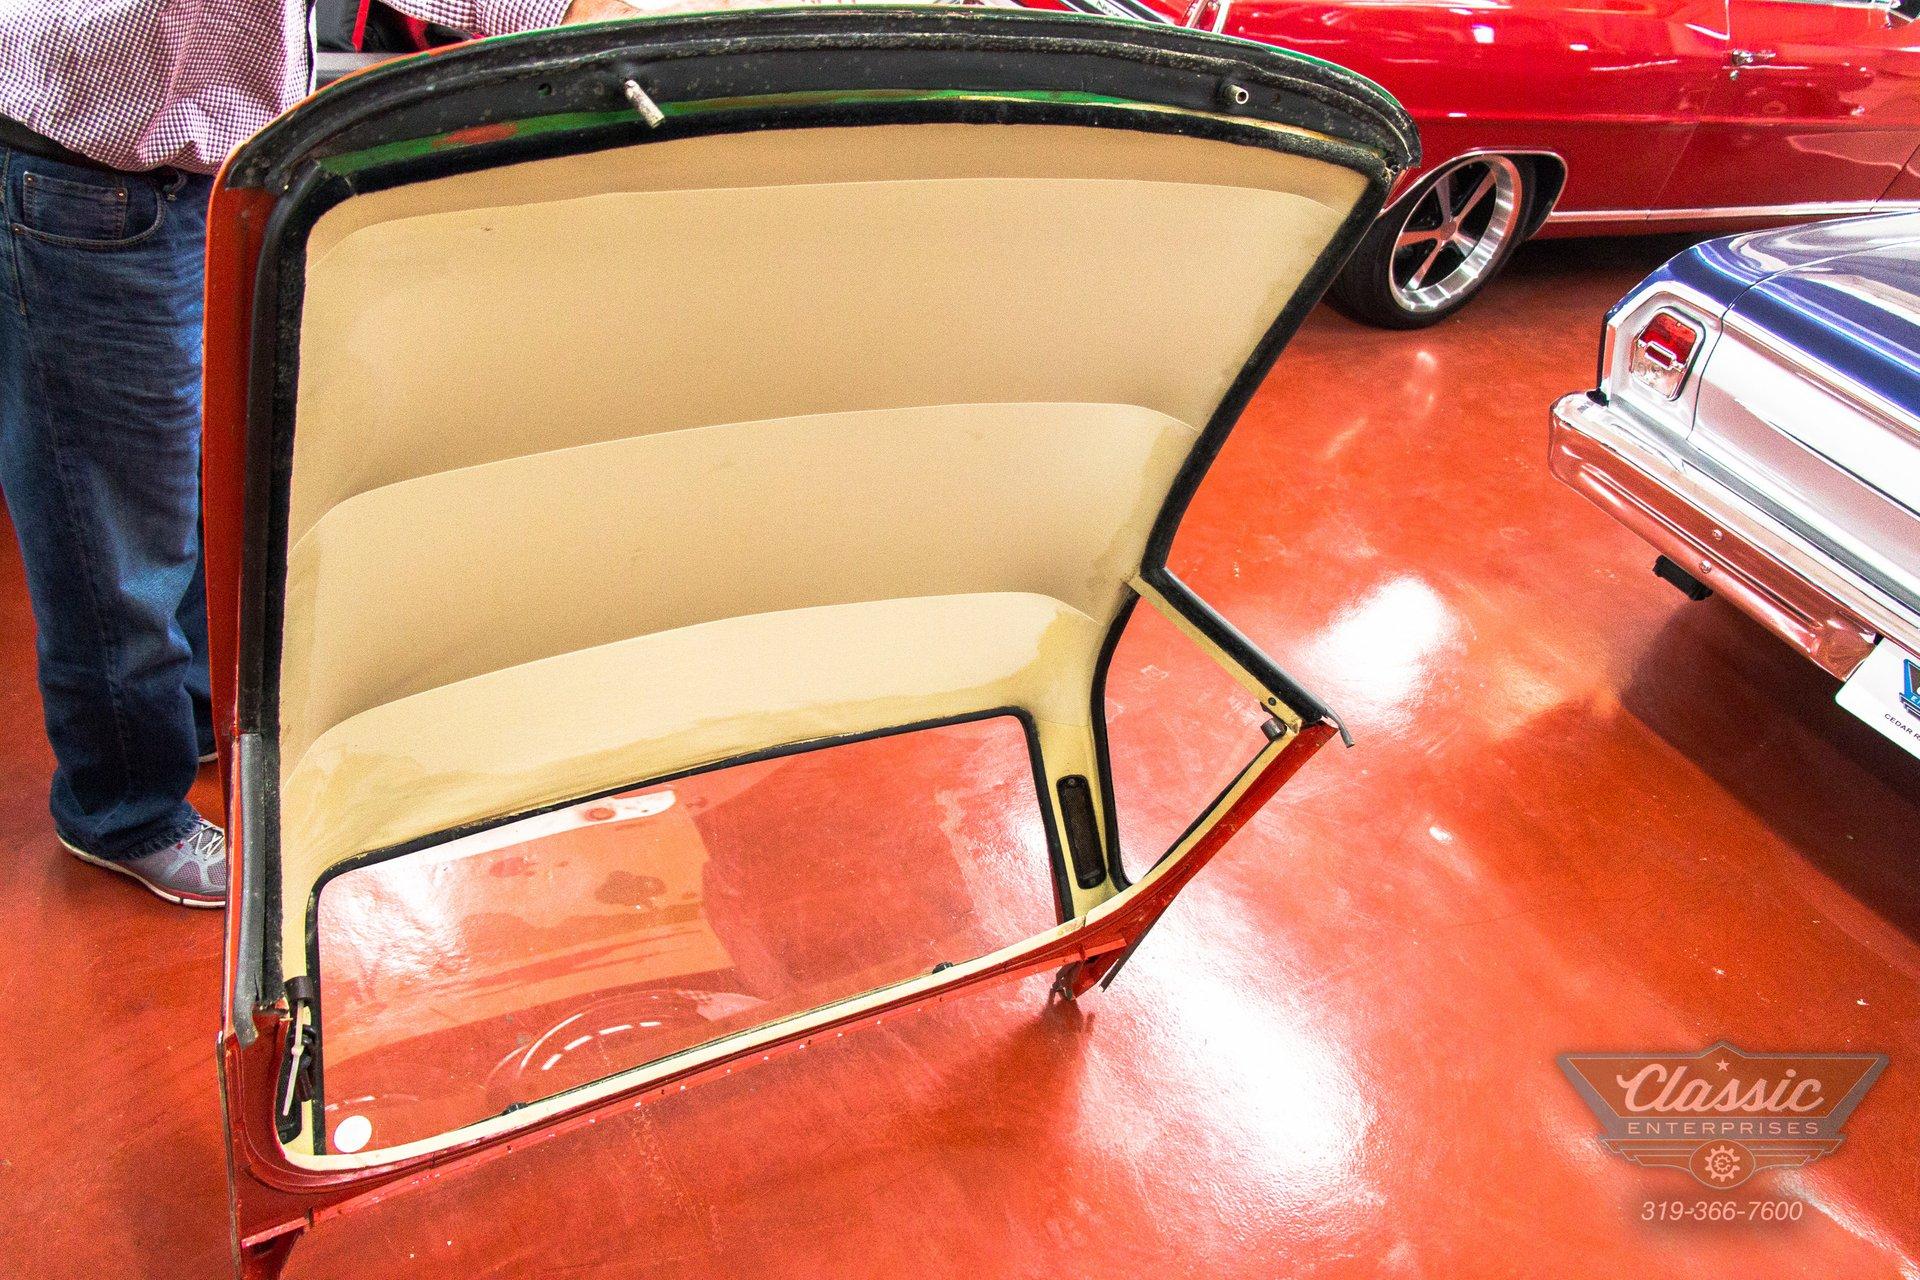 1975 Triumph TR6 | Duffy's Classic Cars